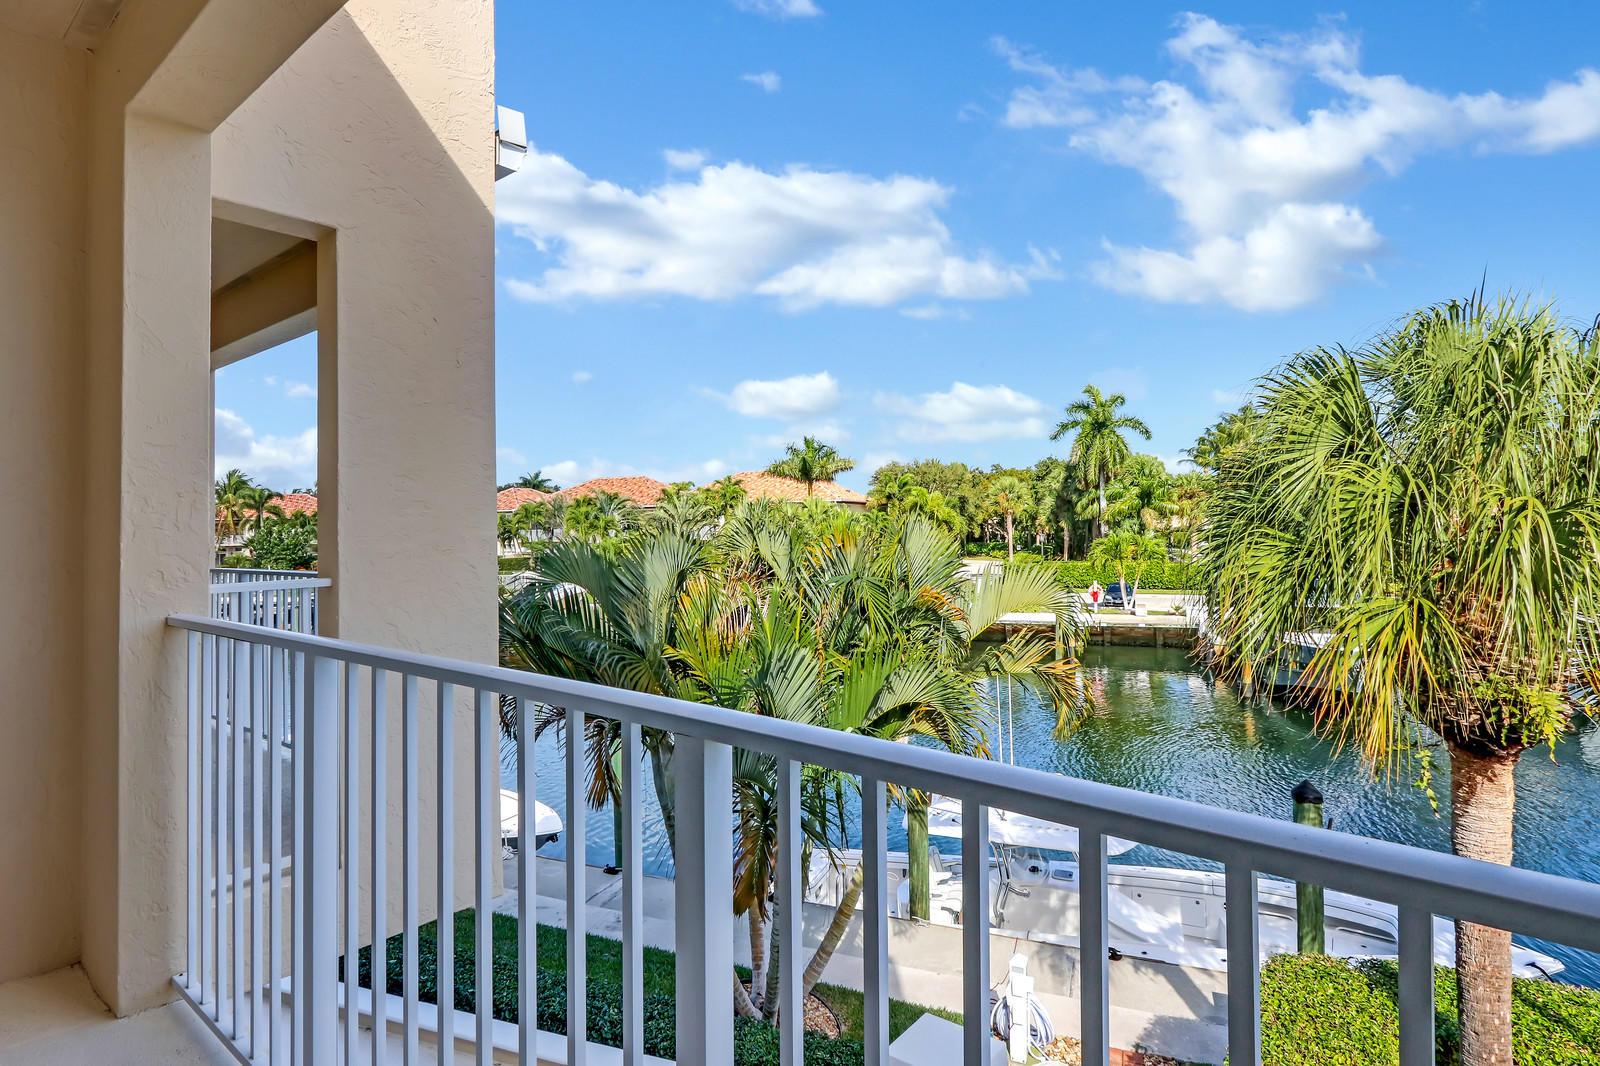 2245 Monet Road, North Palm Beach, Florida 33410, 3 Bedrooms Bedrooms, ,3.1 BathroomsBathrooms,A,Townhouse,Monet,RX-10493161